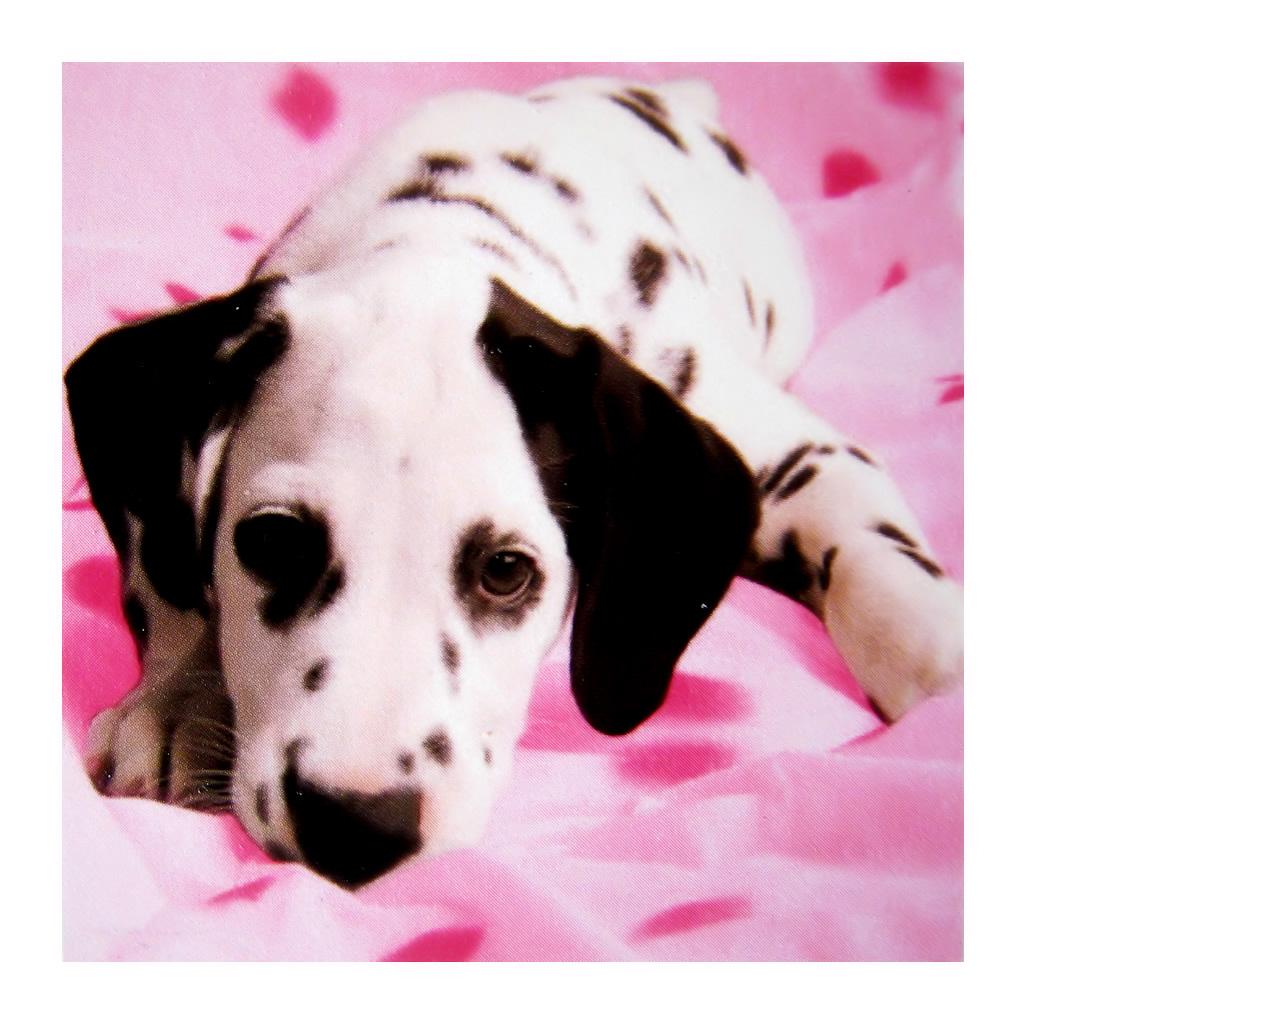 download wallpaper: Dalmatier wallpaper